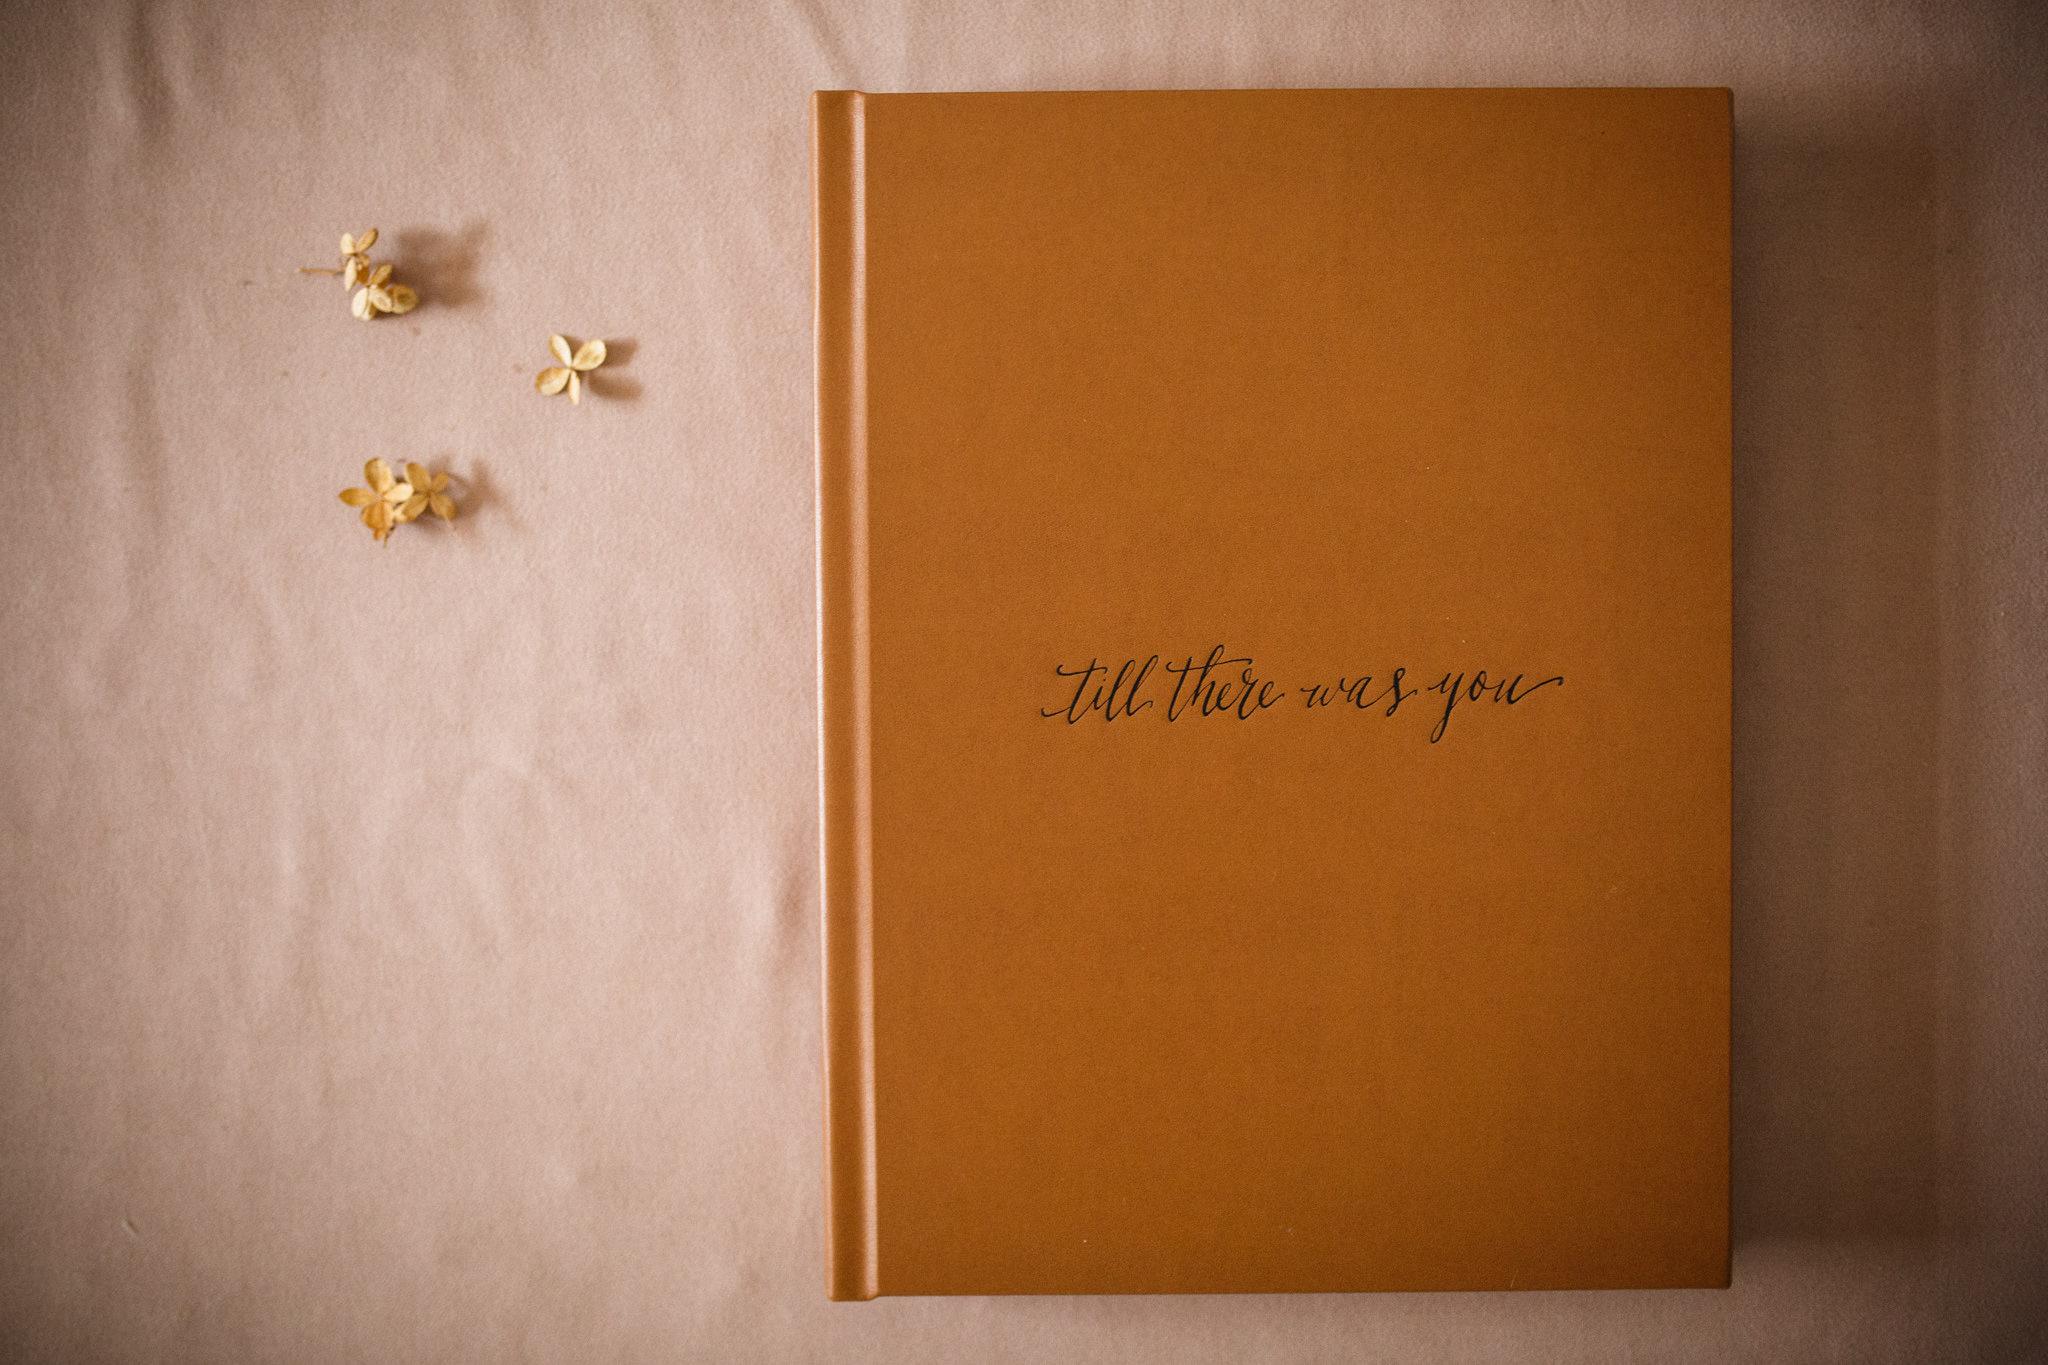 Leather cover of wedding album in Toronto.